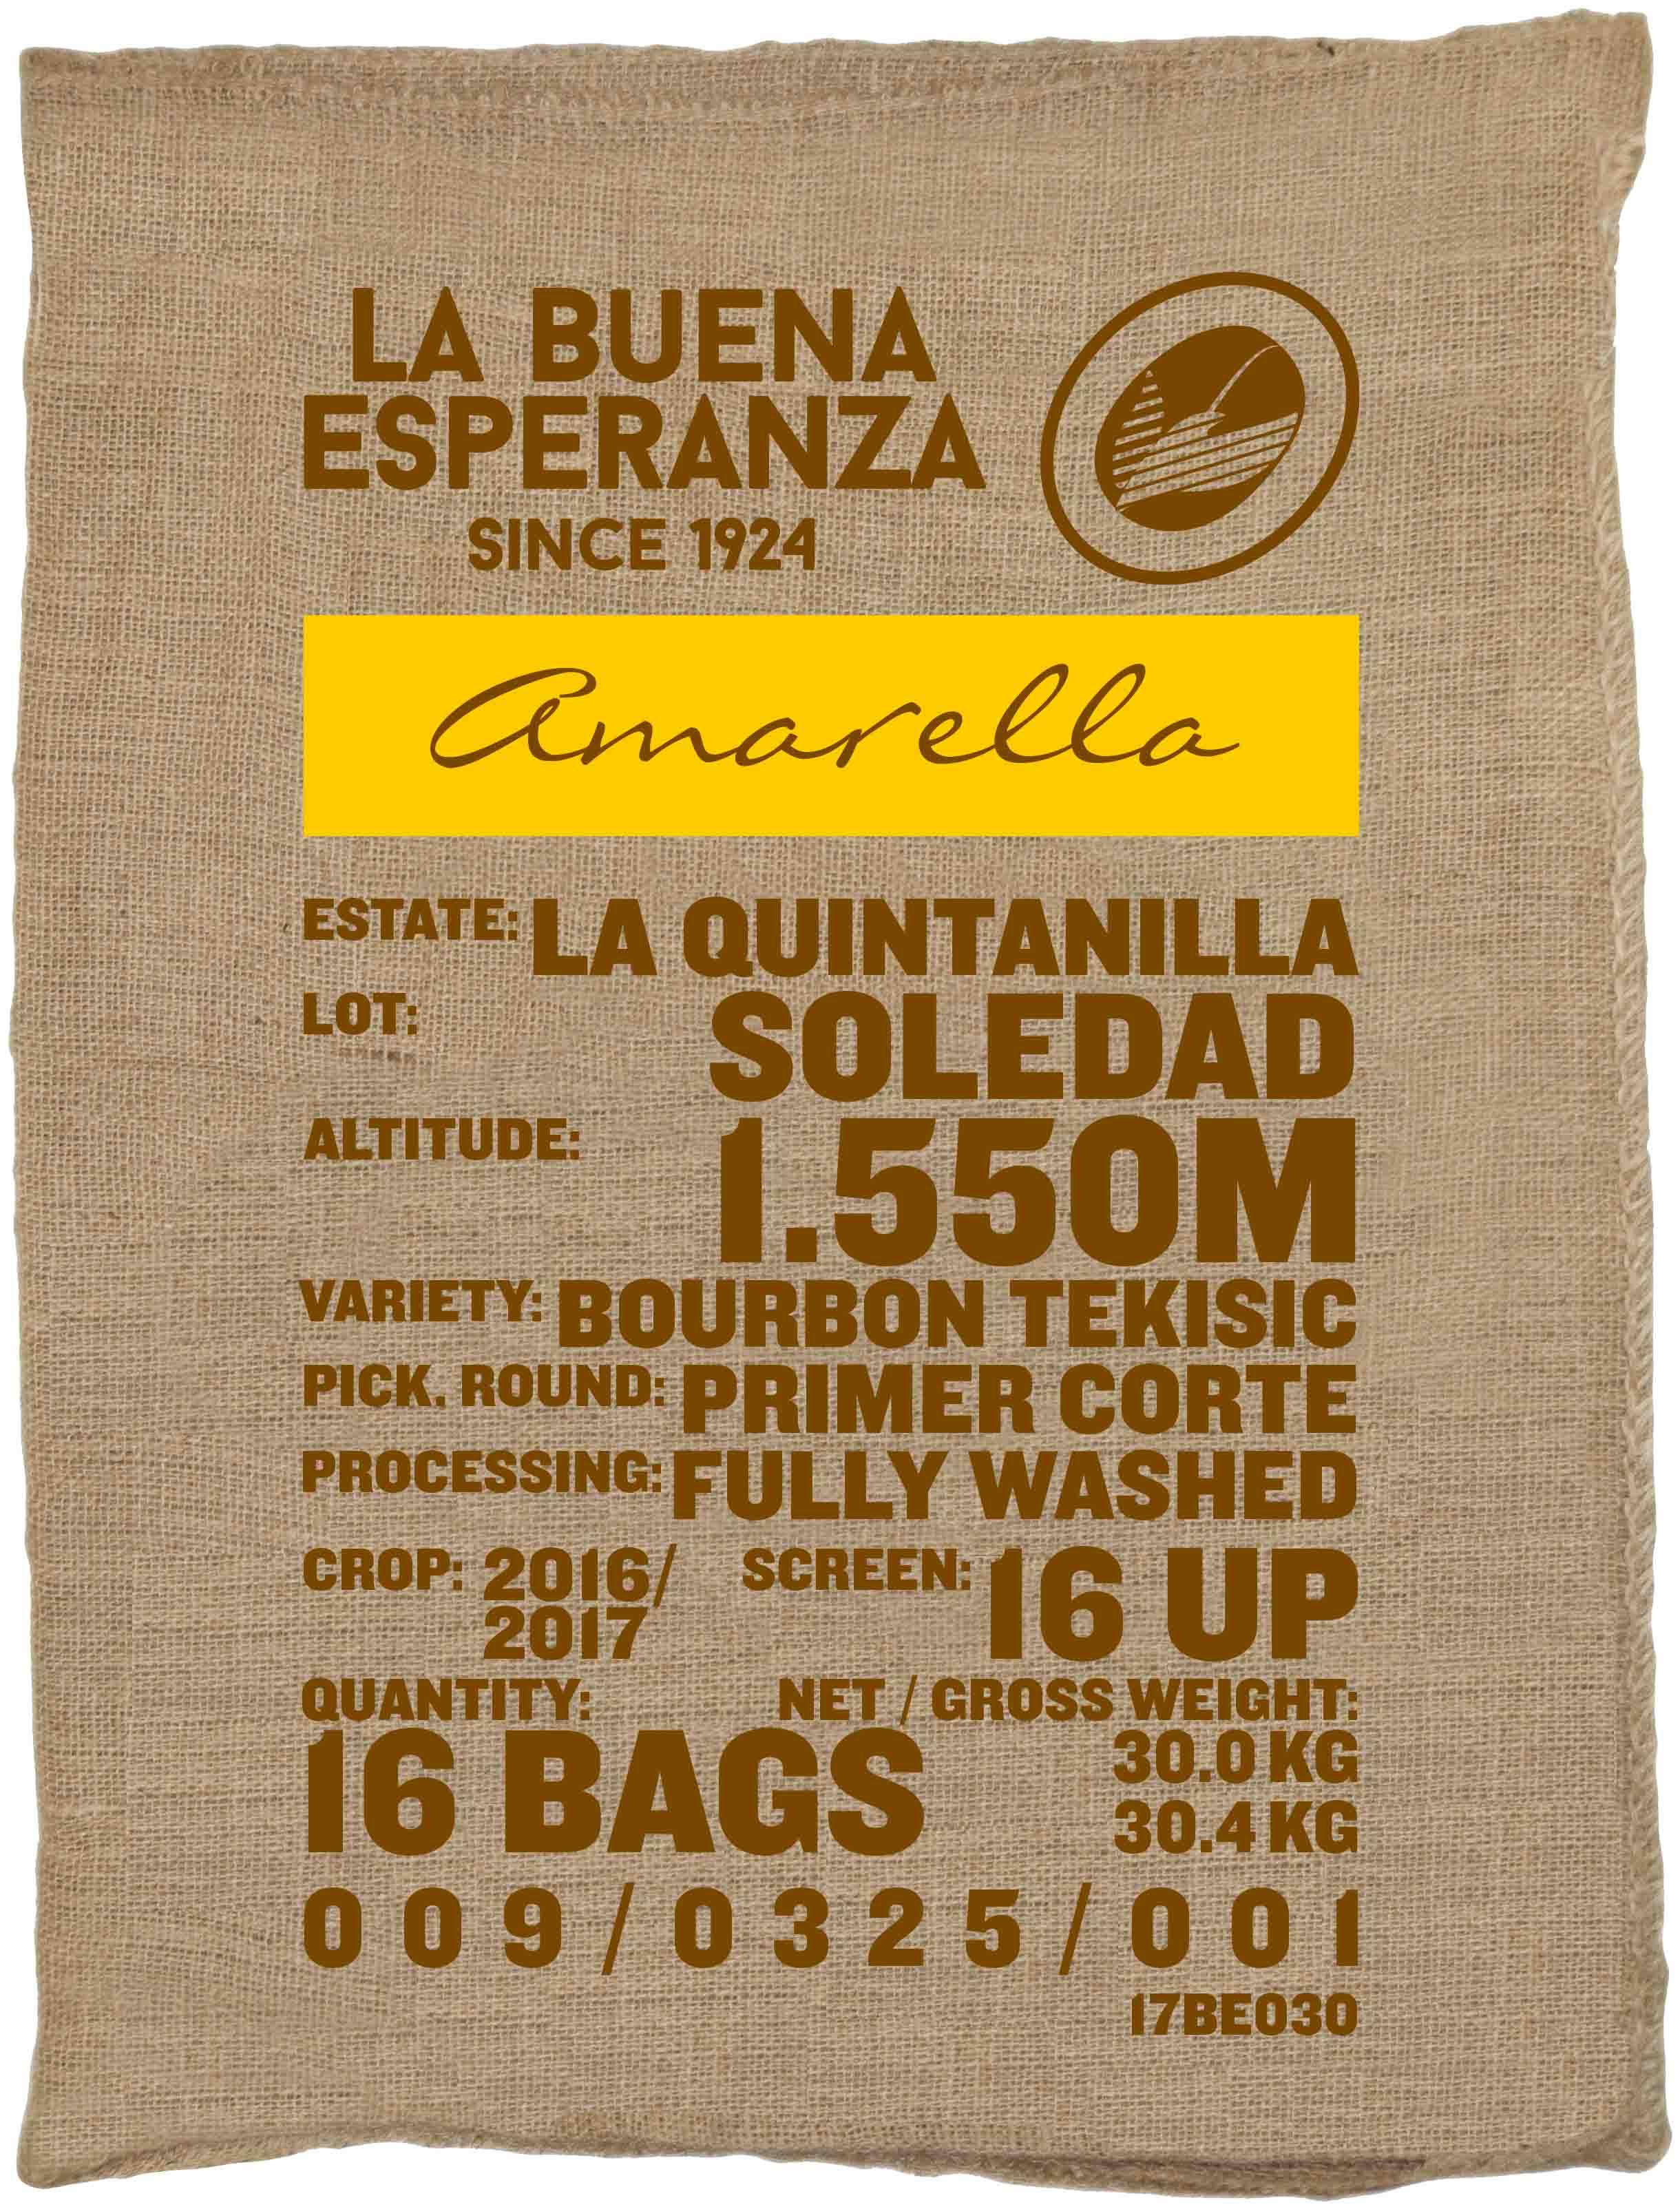 Ein Rohkaffeesack amarella Parzellenkaffee Varietät Bourbon Tekisic. Finca La Buena Esperanza Lot Soledad.